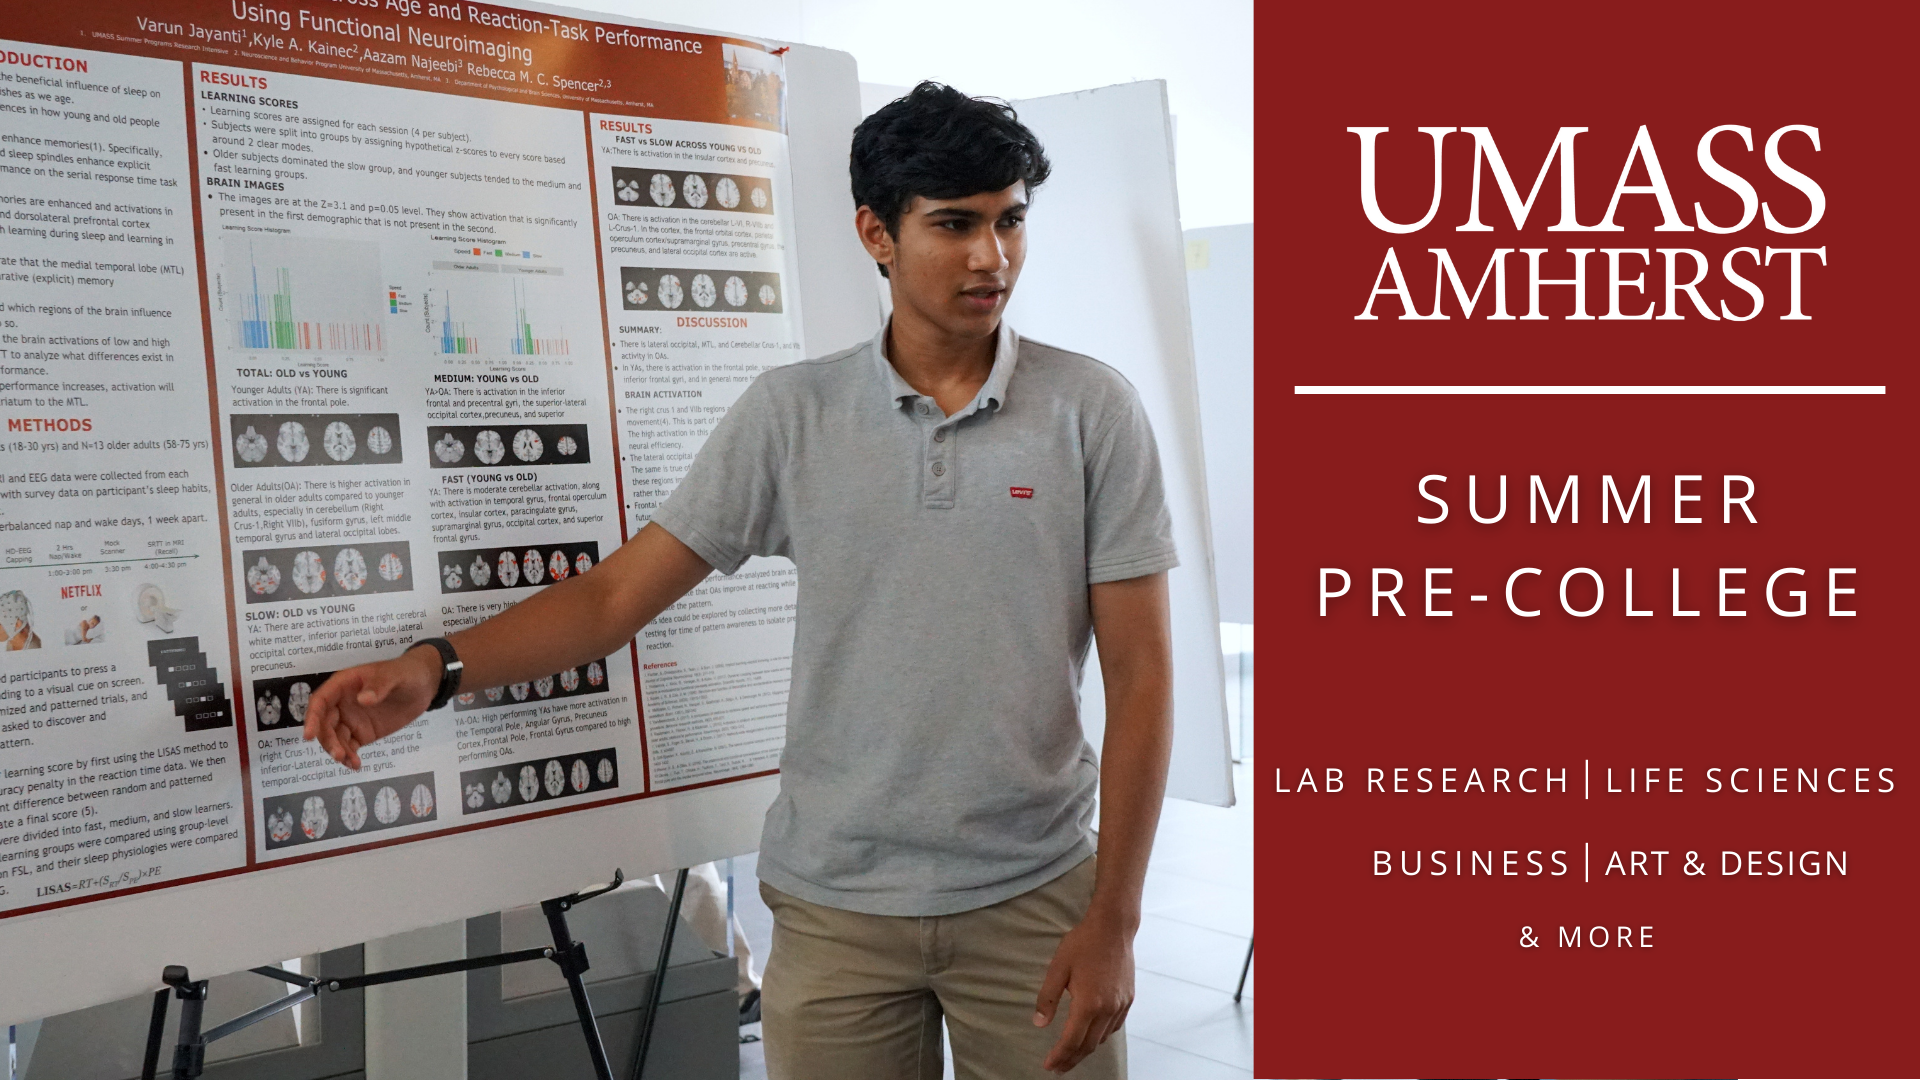 Summer Program - Architecture | UMass Amherst Pre-College Programs